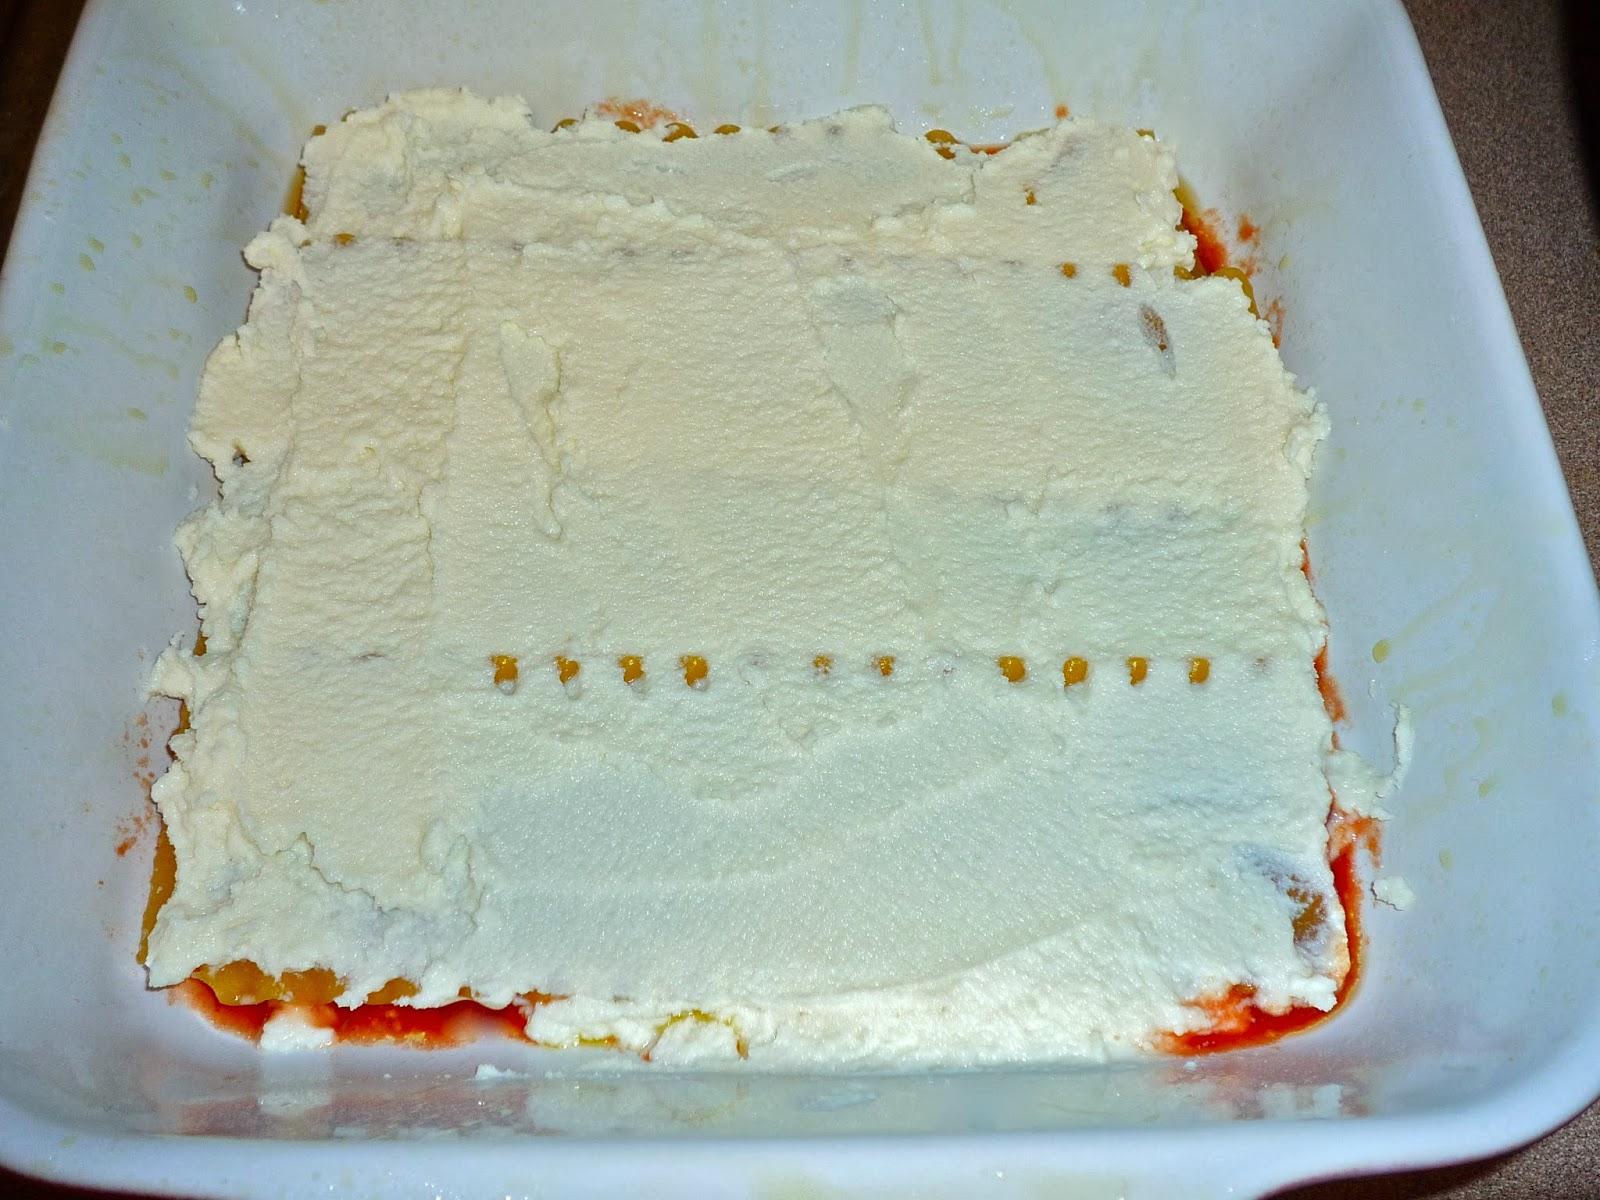 The Weekend Gourmet Rglasagna Party Featuring Lighten